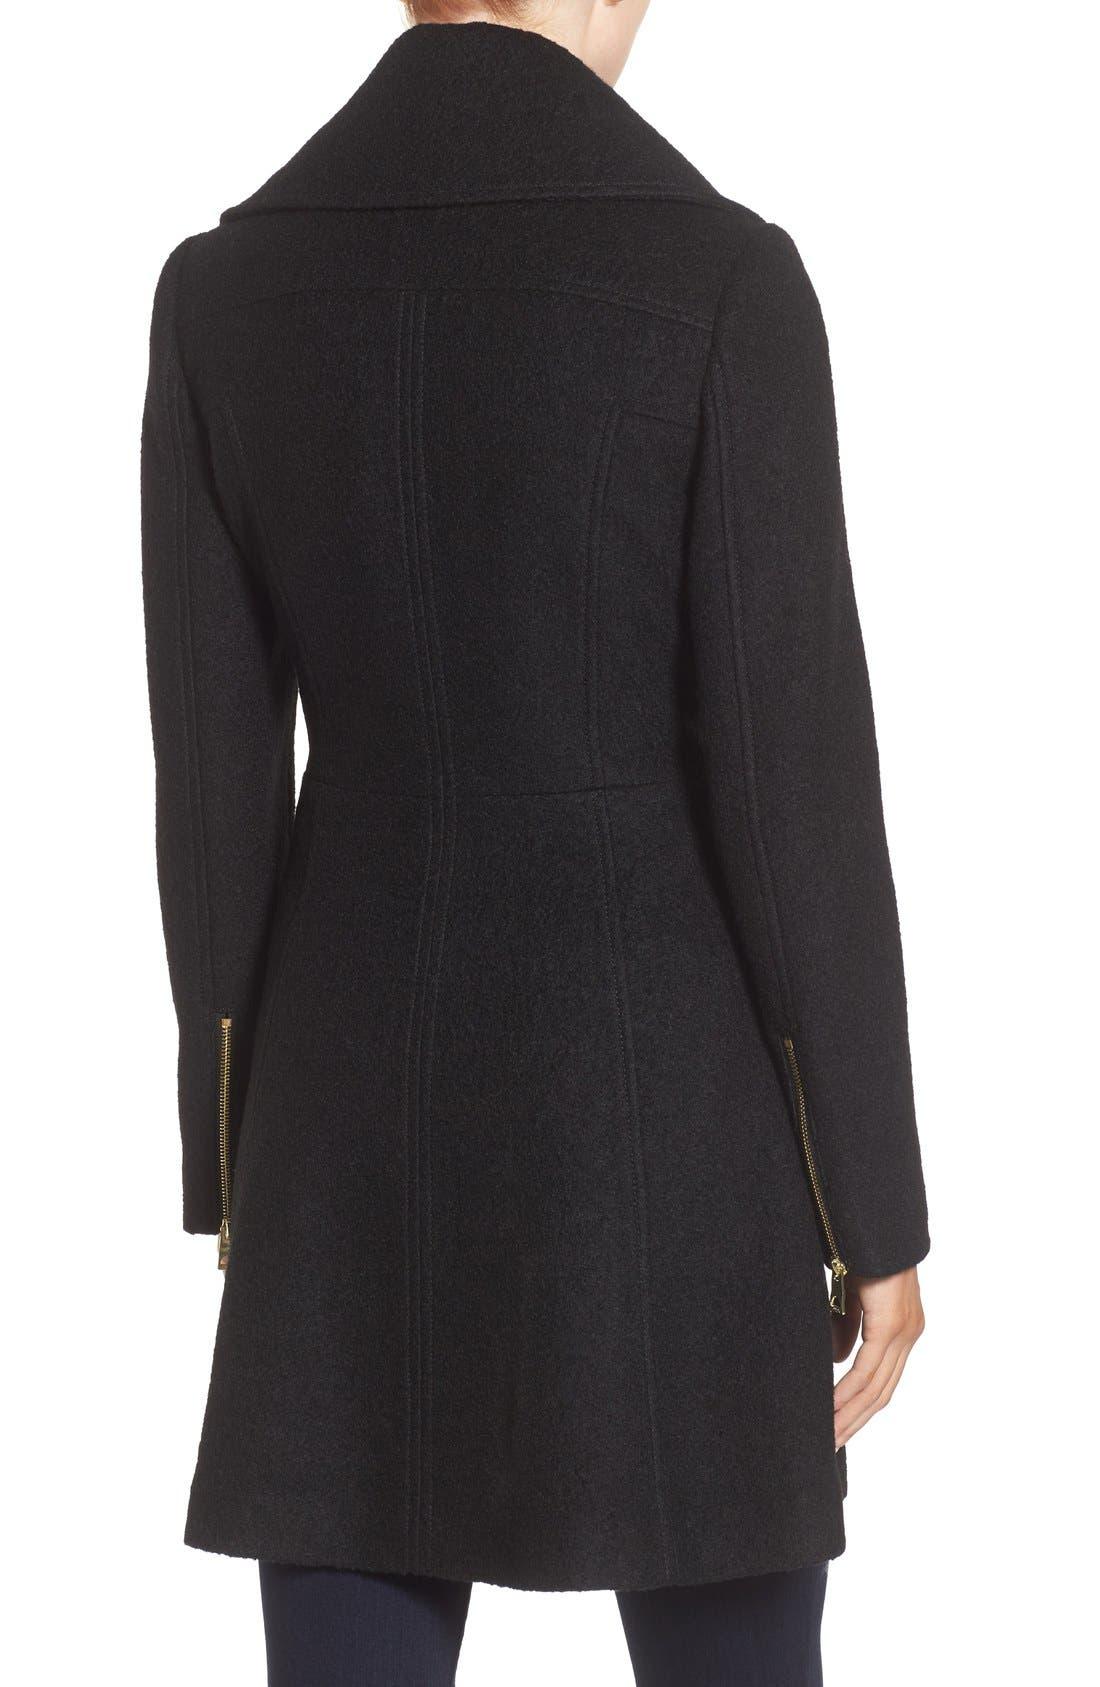 Alternate Image 2  - GUESS Envelope Collar Double Breasted Coat (Regular & Petite)